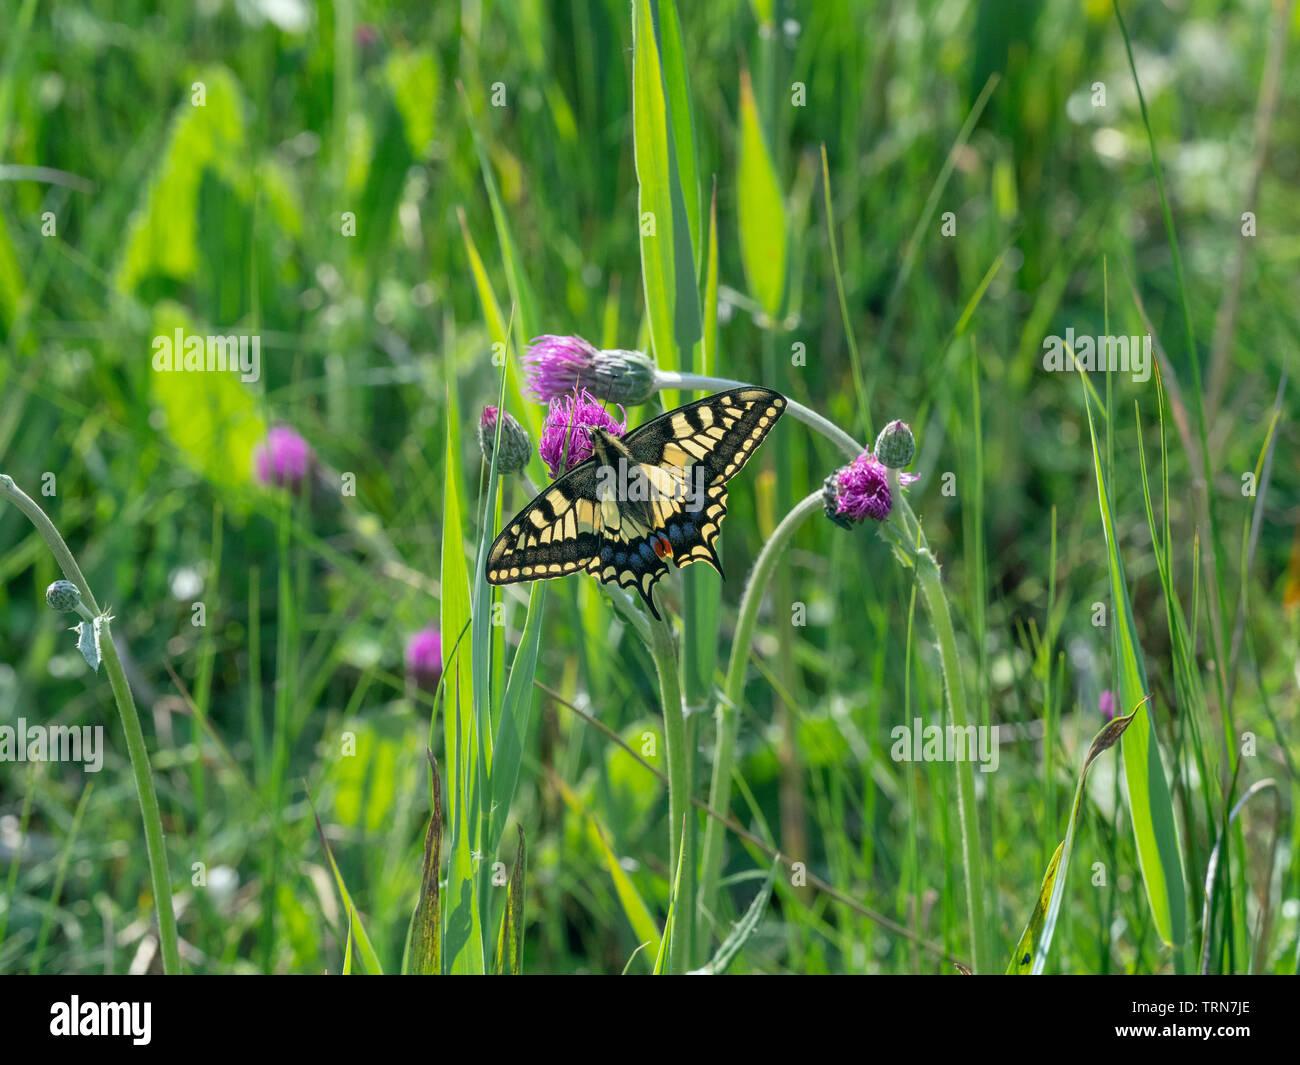 Especie de mariposa Papilio machaon en Norfolk Broads Foto de stock